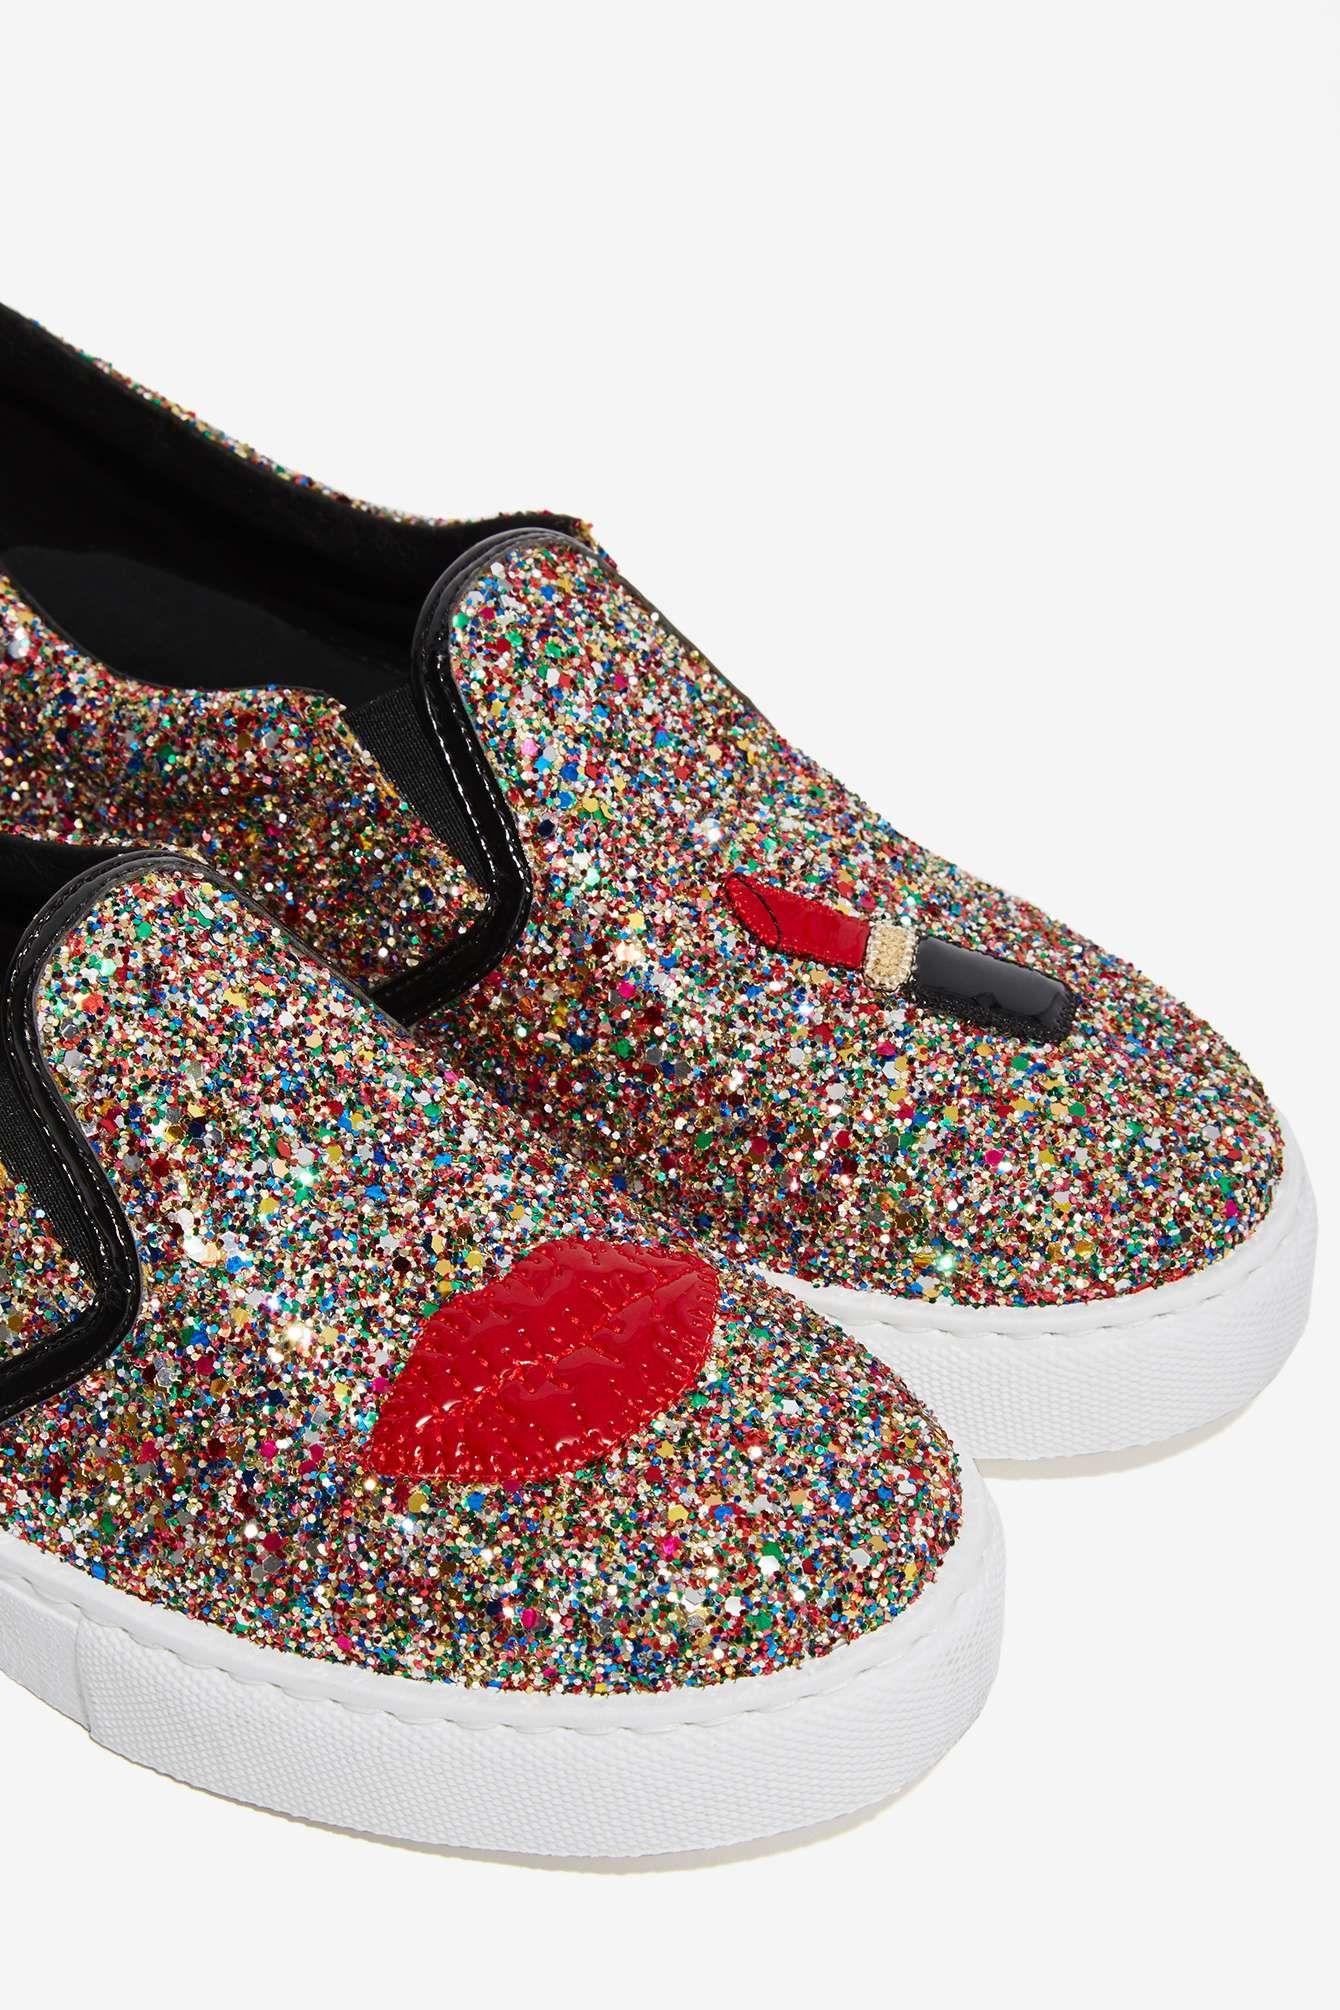 Chiara Ferragni Glitter Lips Slip-On Sneaker   chic chic   Pinterest ... d405c808bf